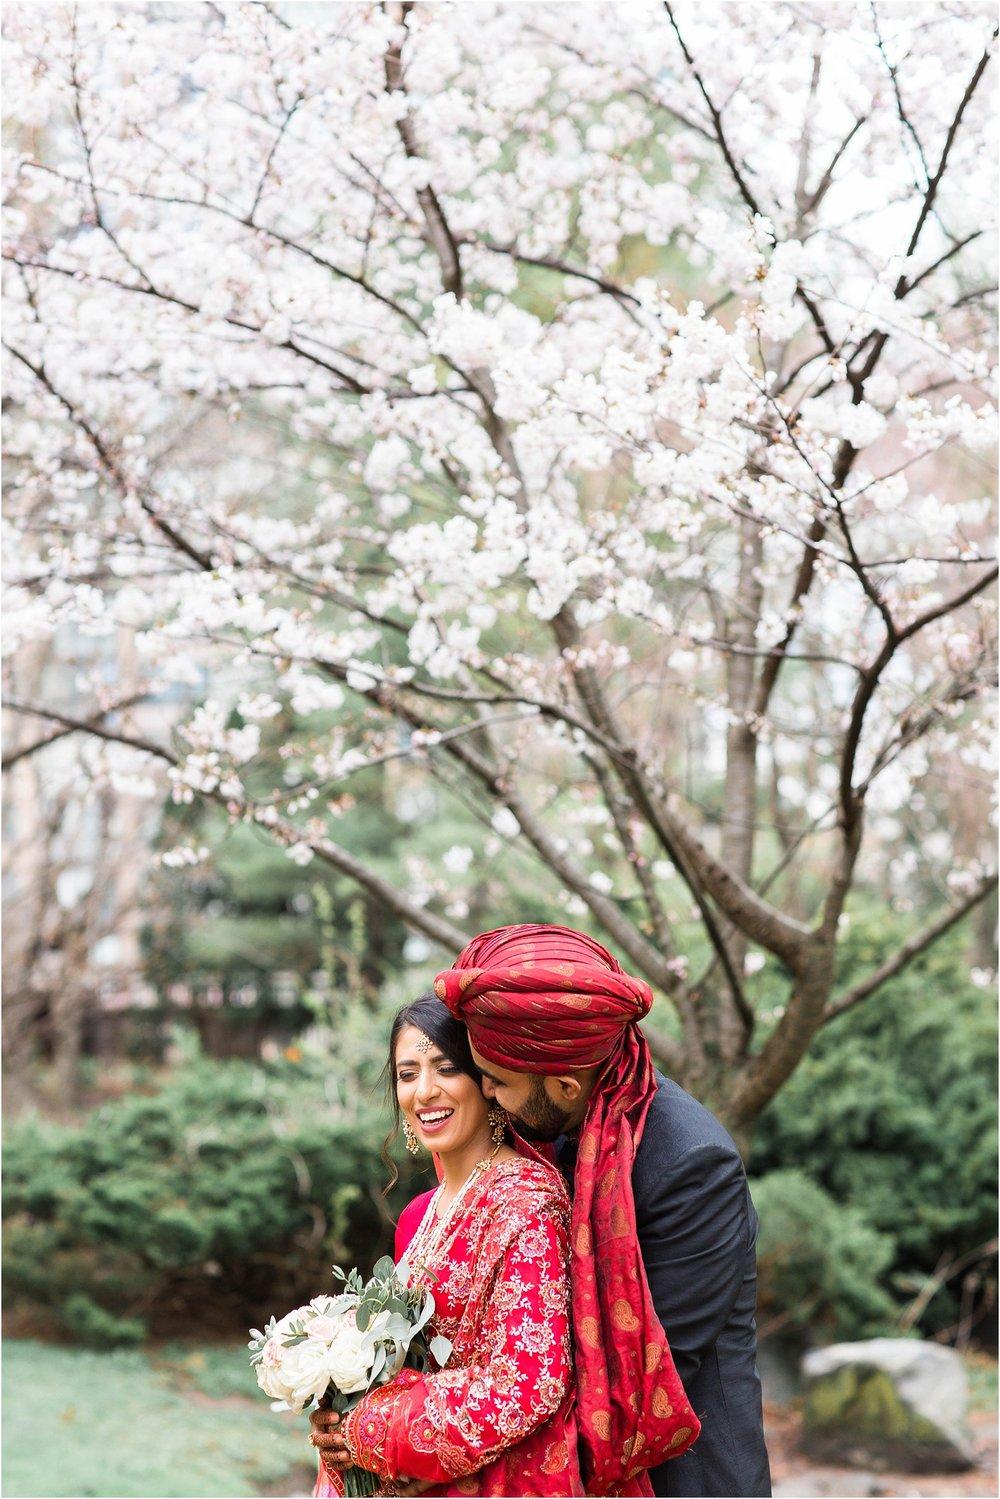 Jame-Masjid-Coopers-Mosque-Kariya-Park-Cherry-Blossoms-Wedding-Toronto-Mississauga-Brampton-Scarborough-GTA-Pakistani-Indian-Wedding-Engagement-Photographer-Photography_0065.jpg